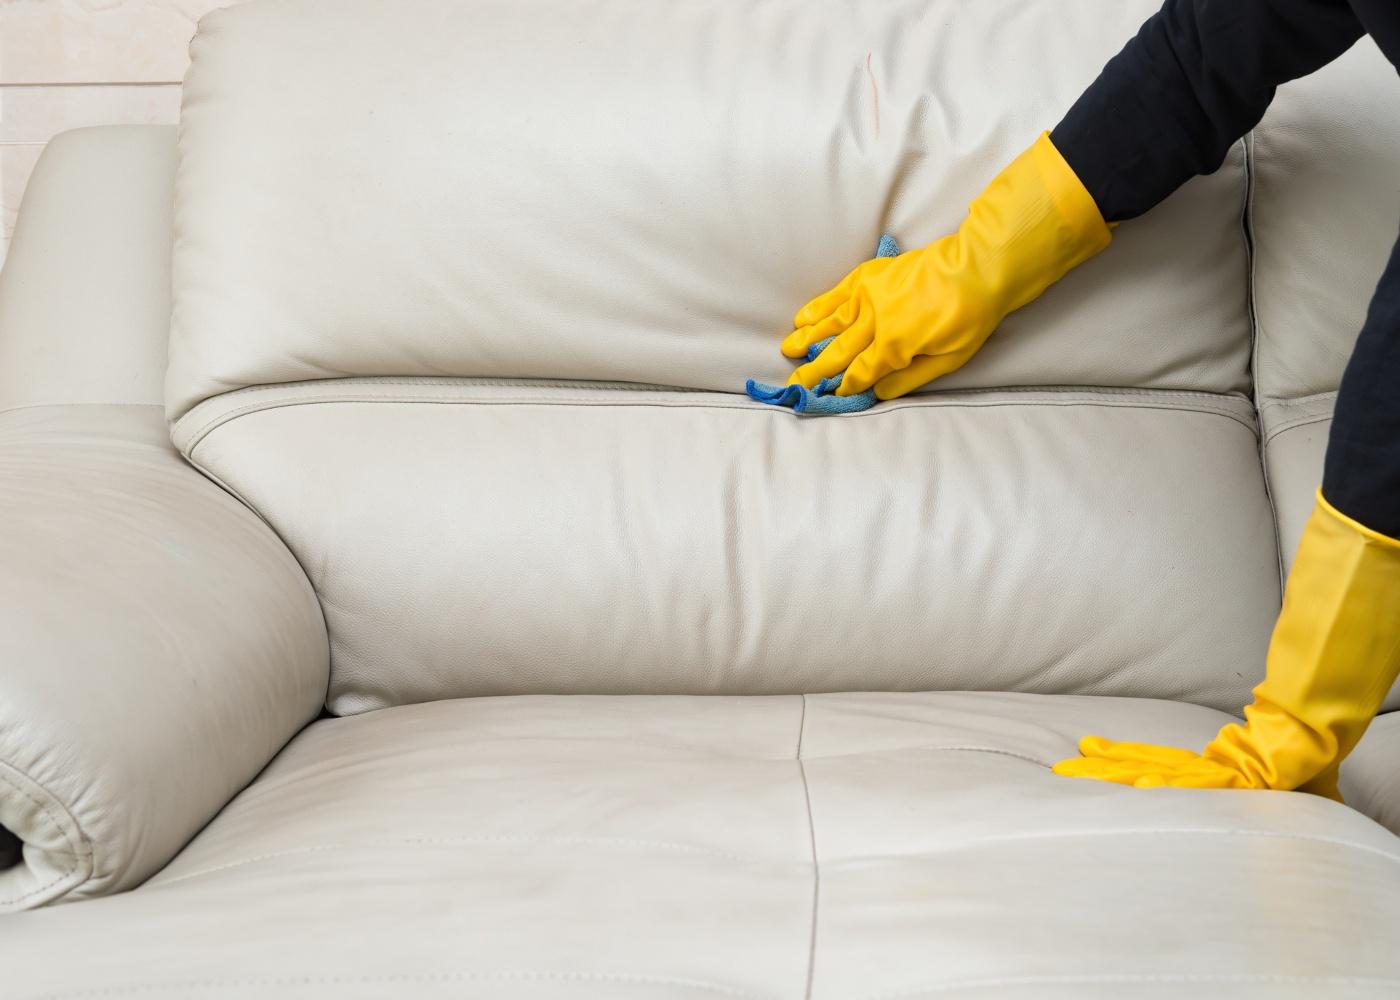 limpar sofá branco